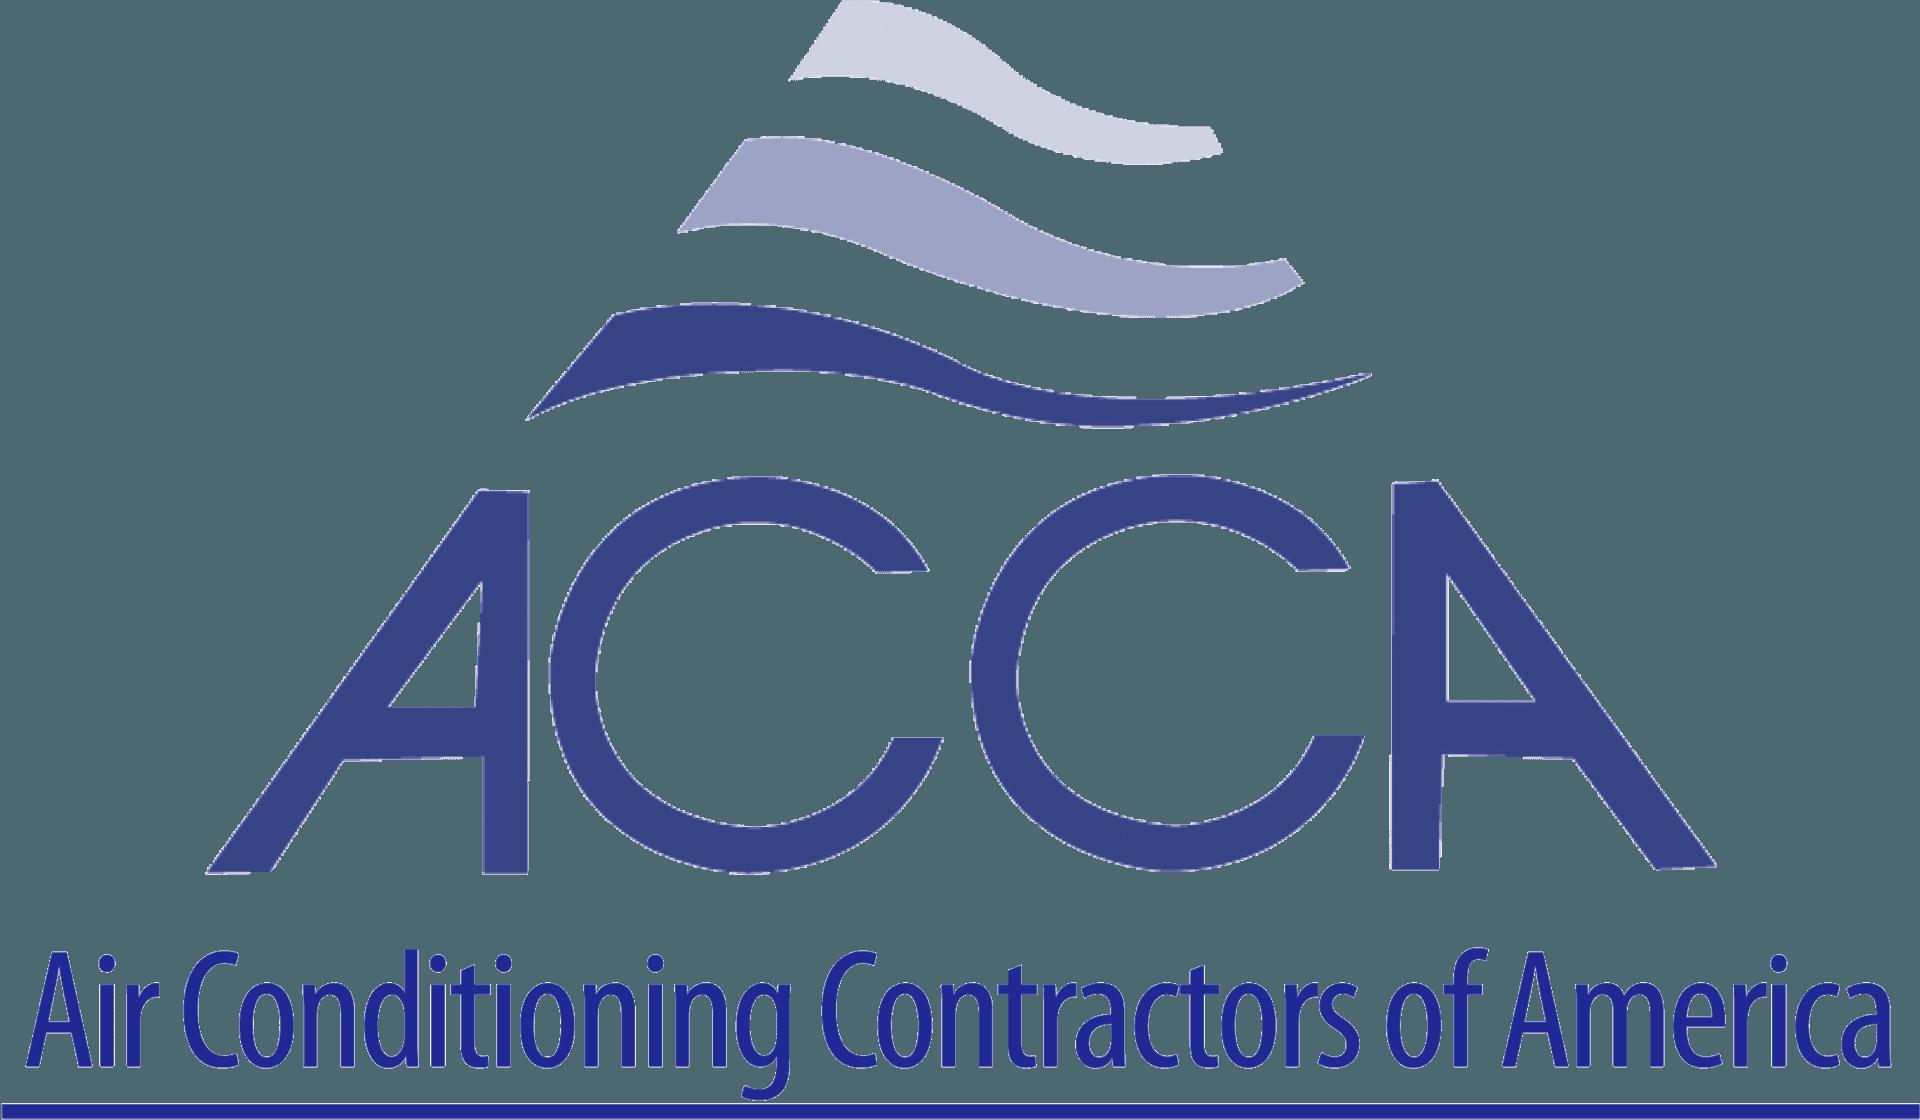 36 HVAC Company Slogan Ideas